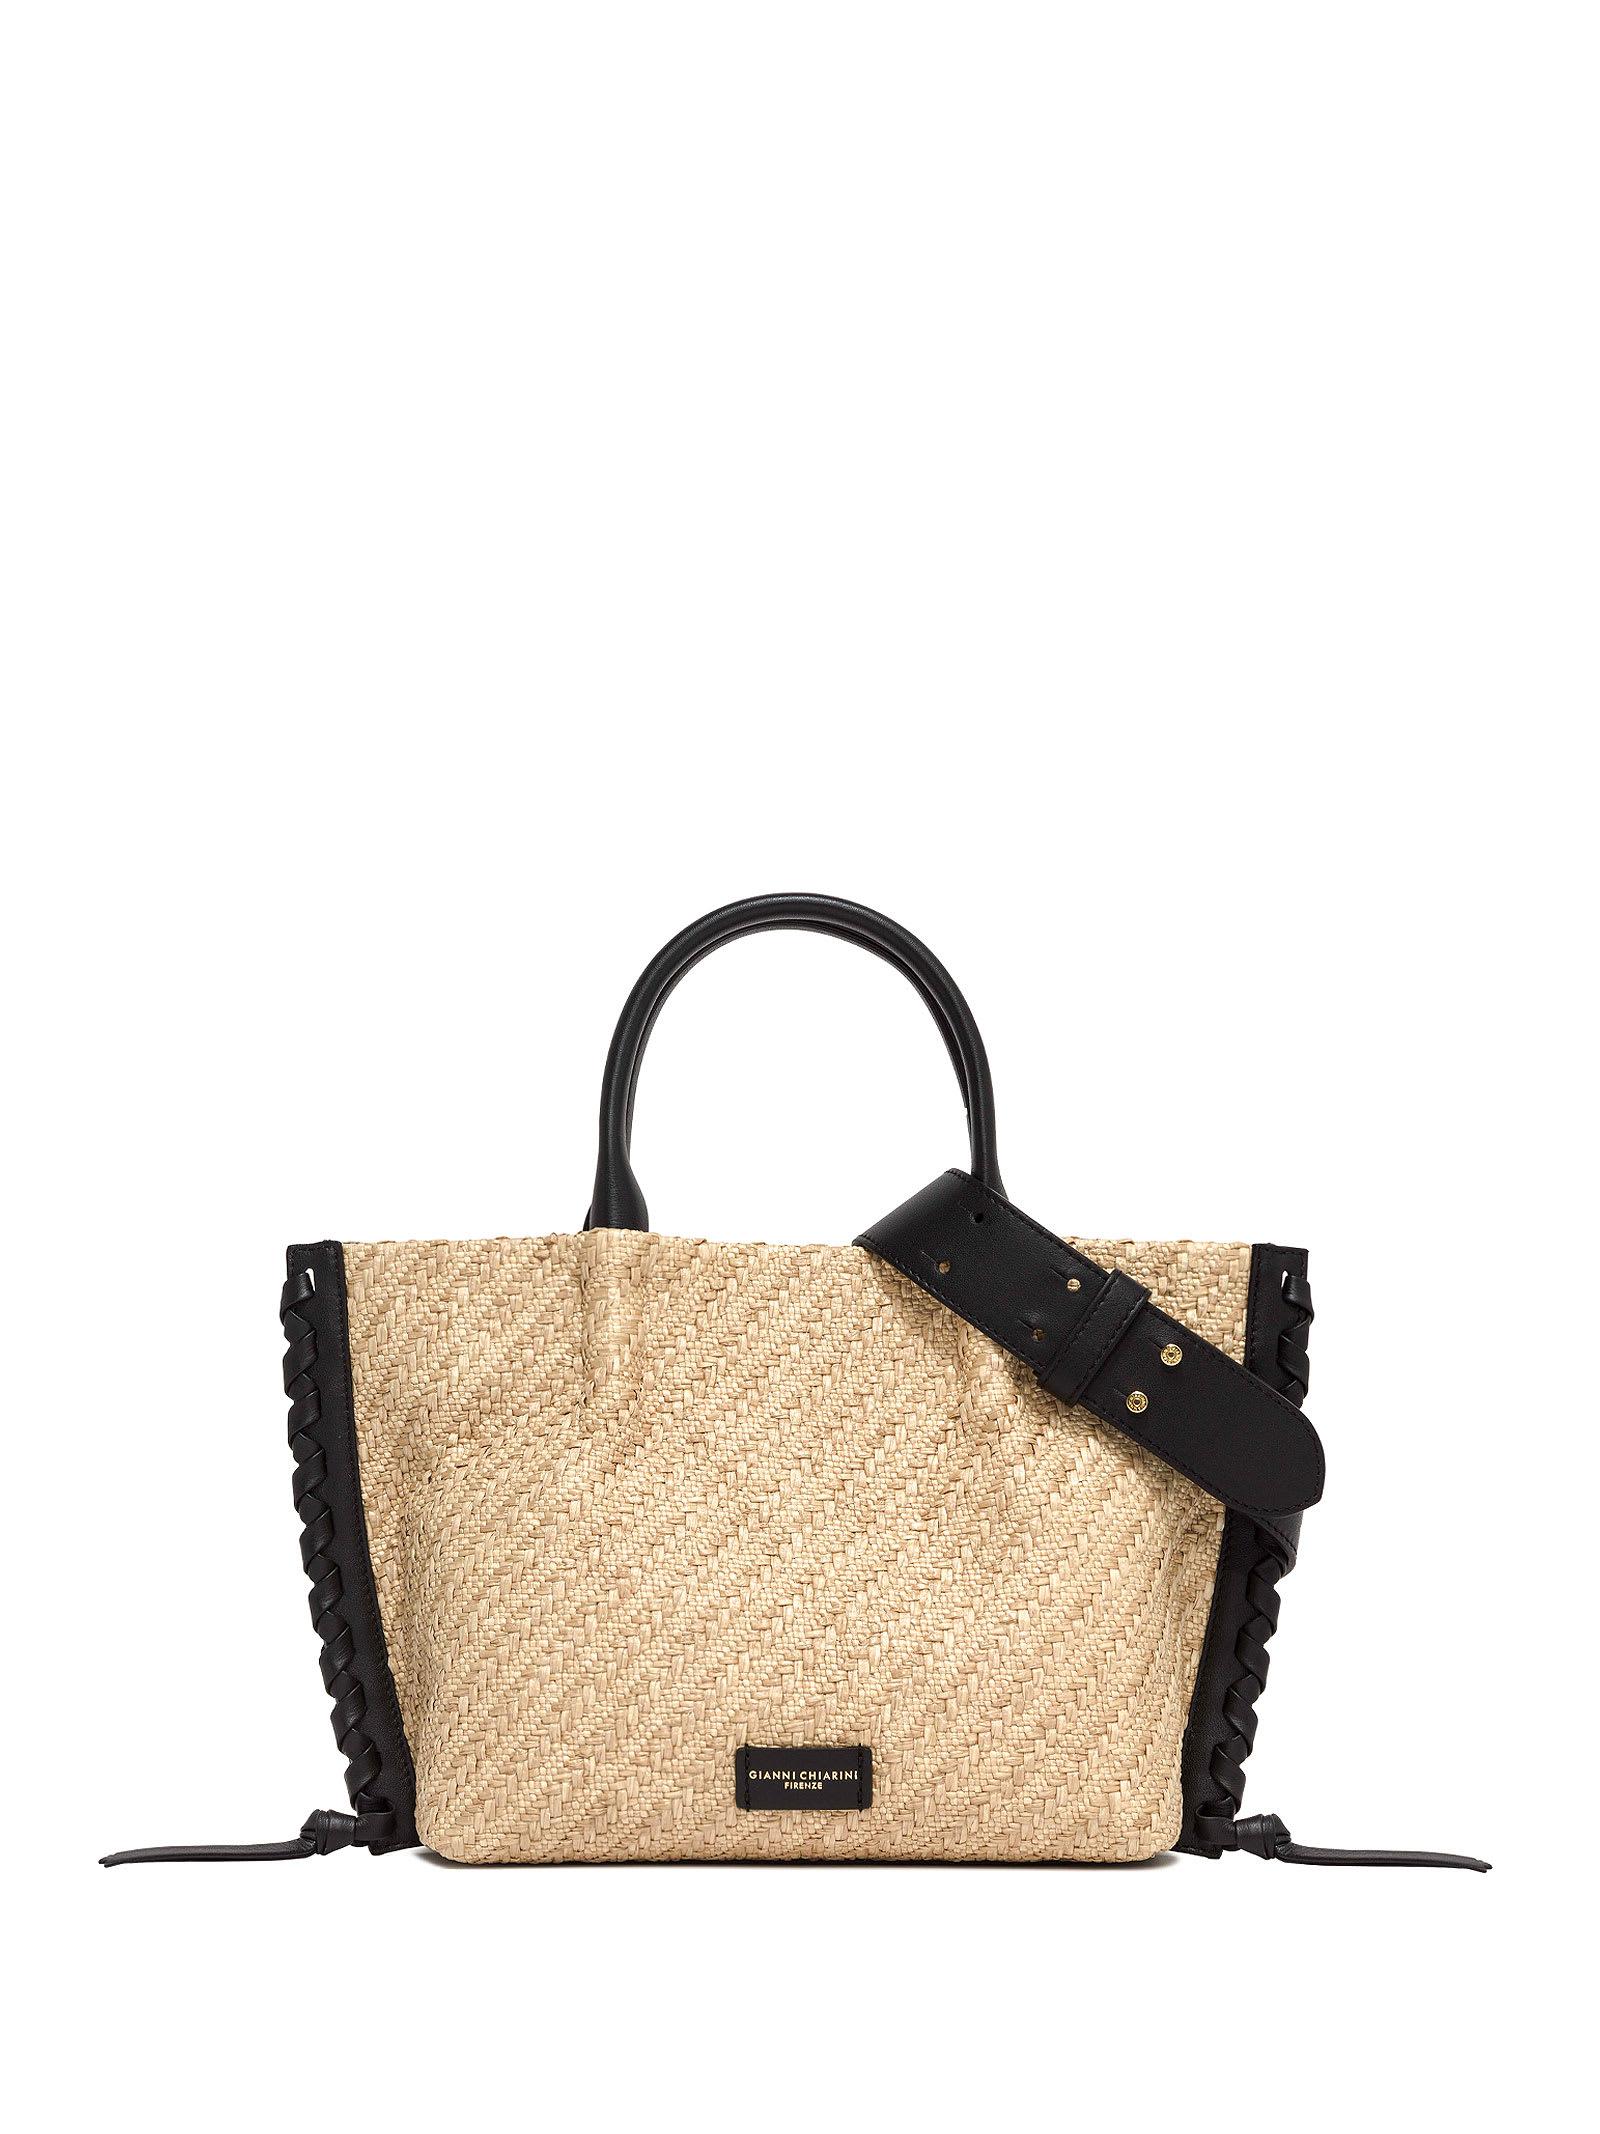 Twenty Shopping Bag